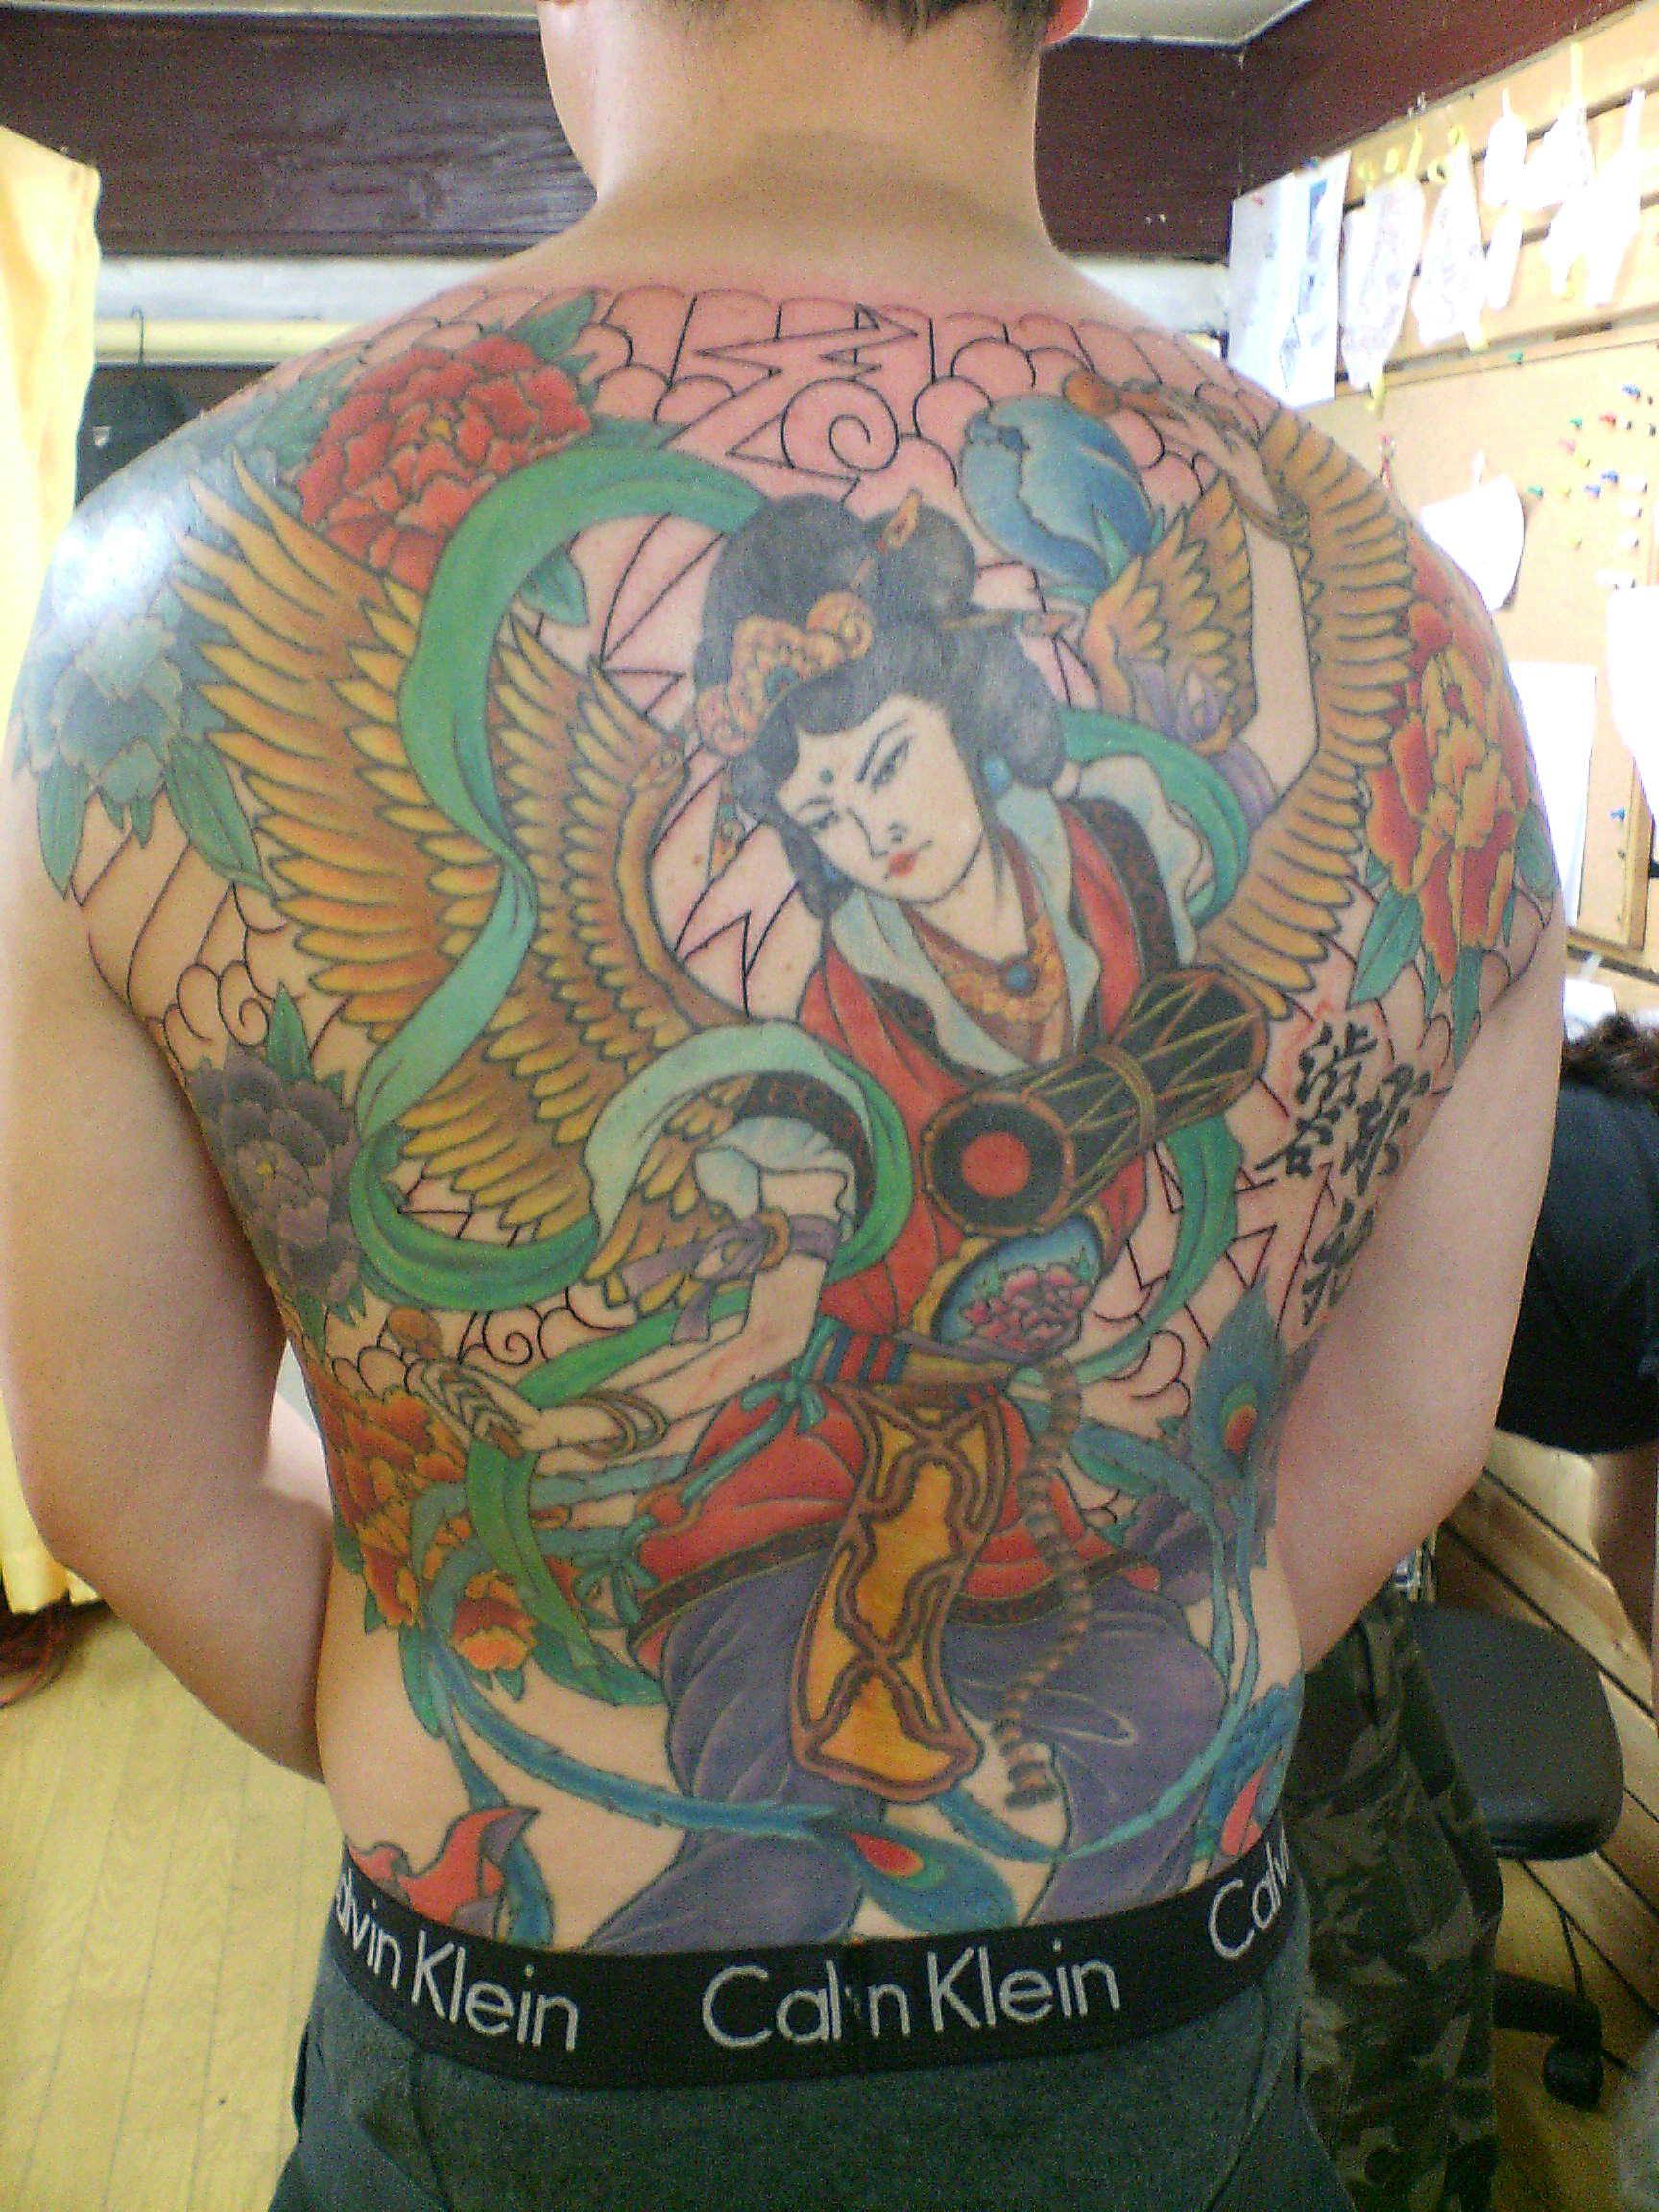 5th harmony tattoo design tattoo design bild